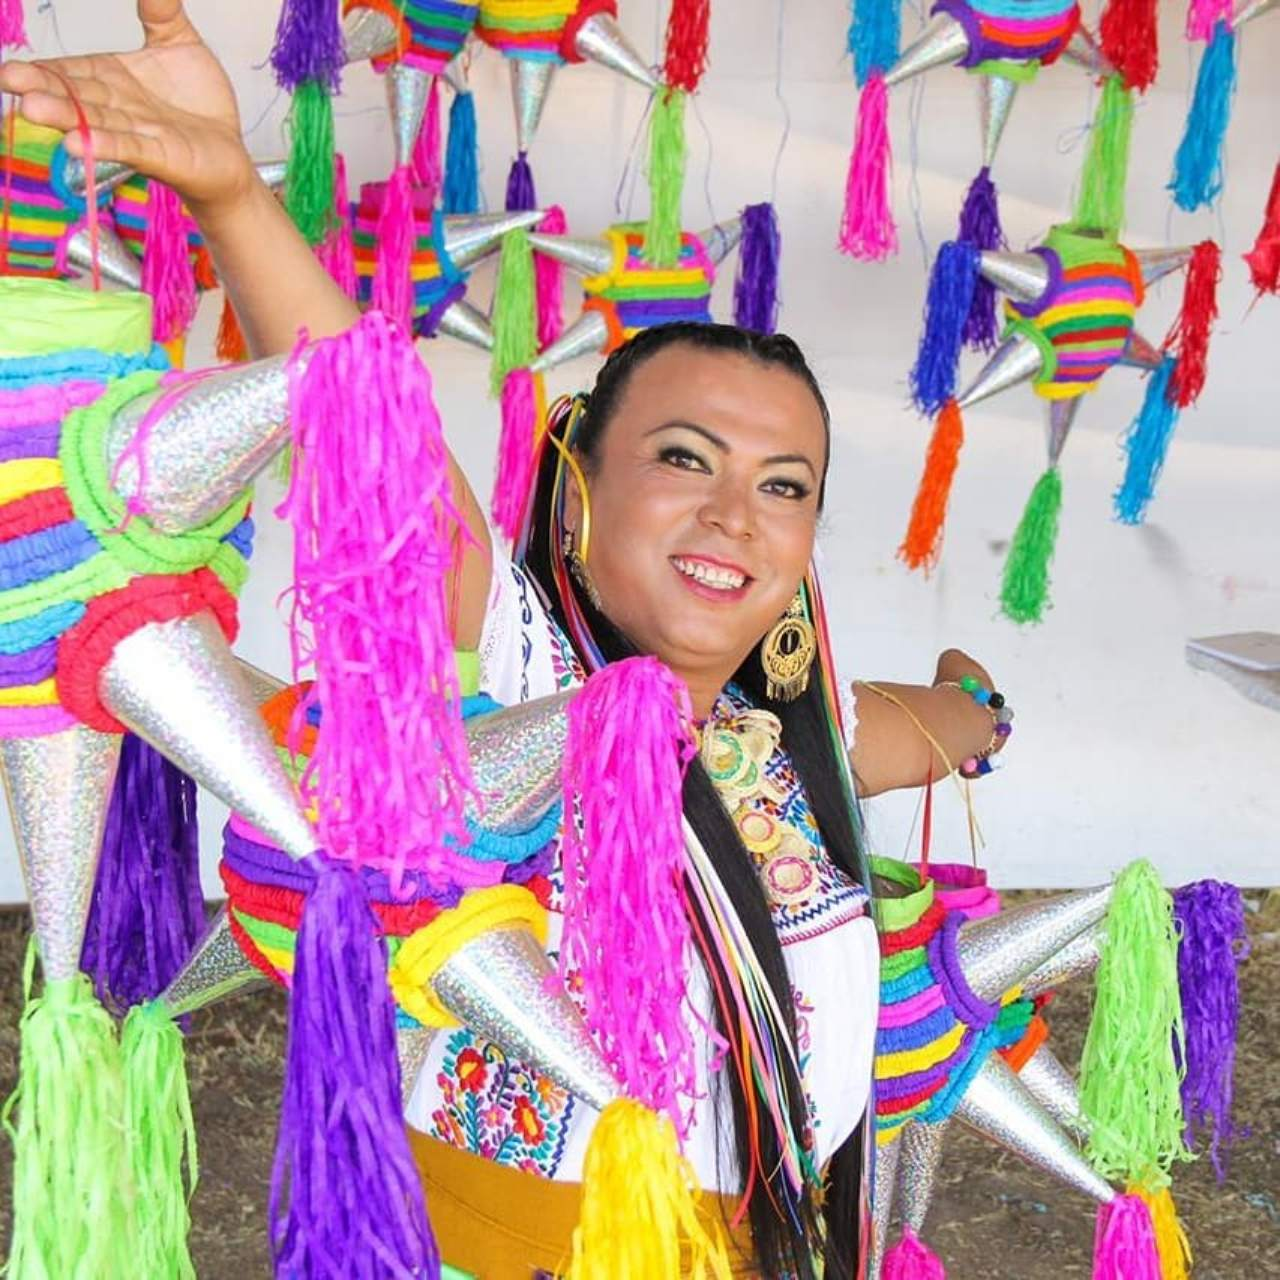 Lady tacos de canasta diputada Coyoacan